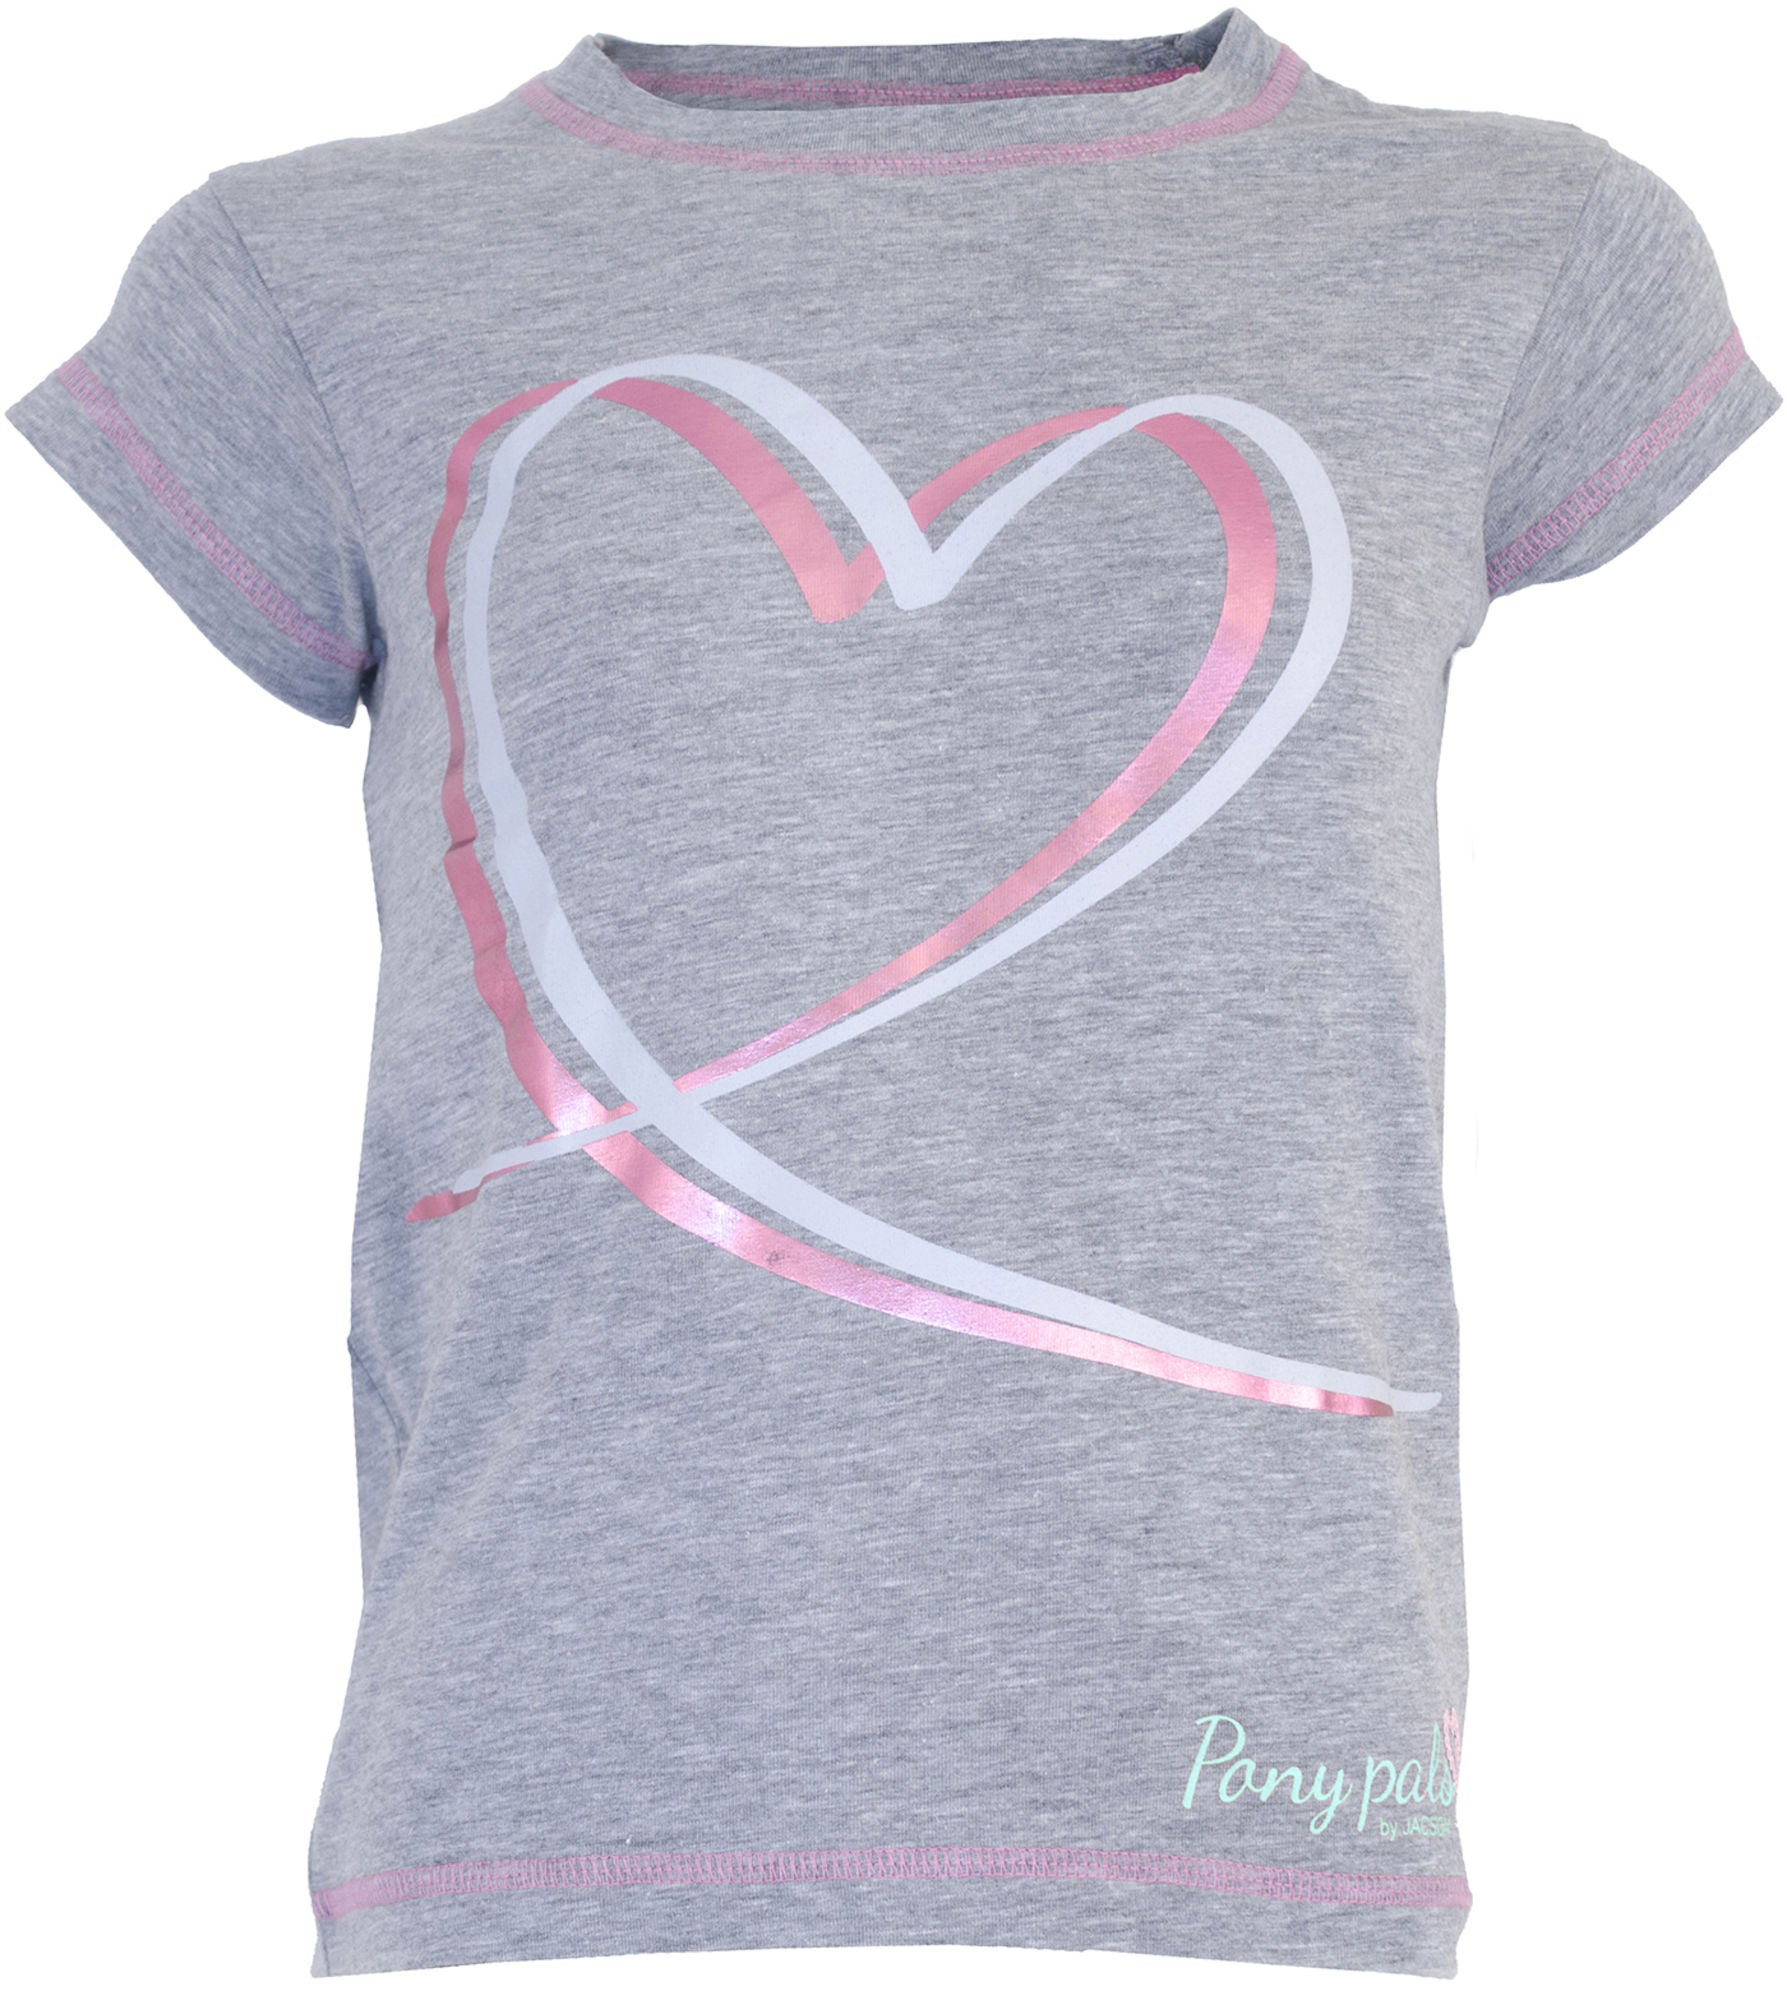 Jacson Pony Pals T-shirt, Grå 110